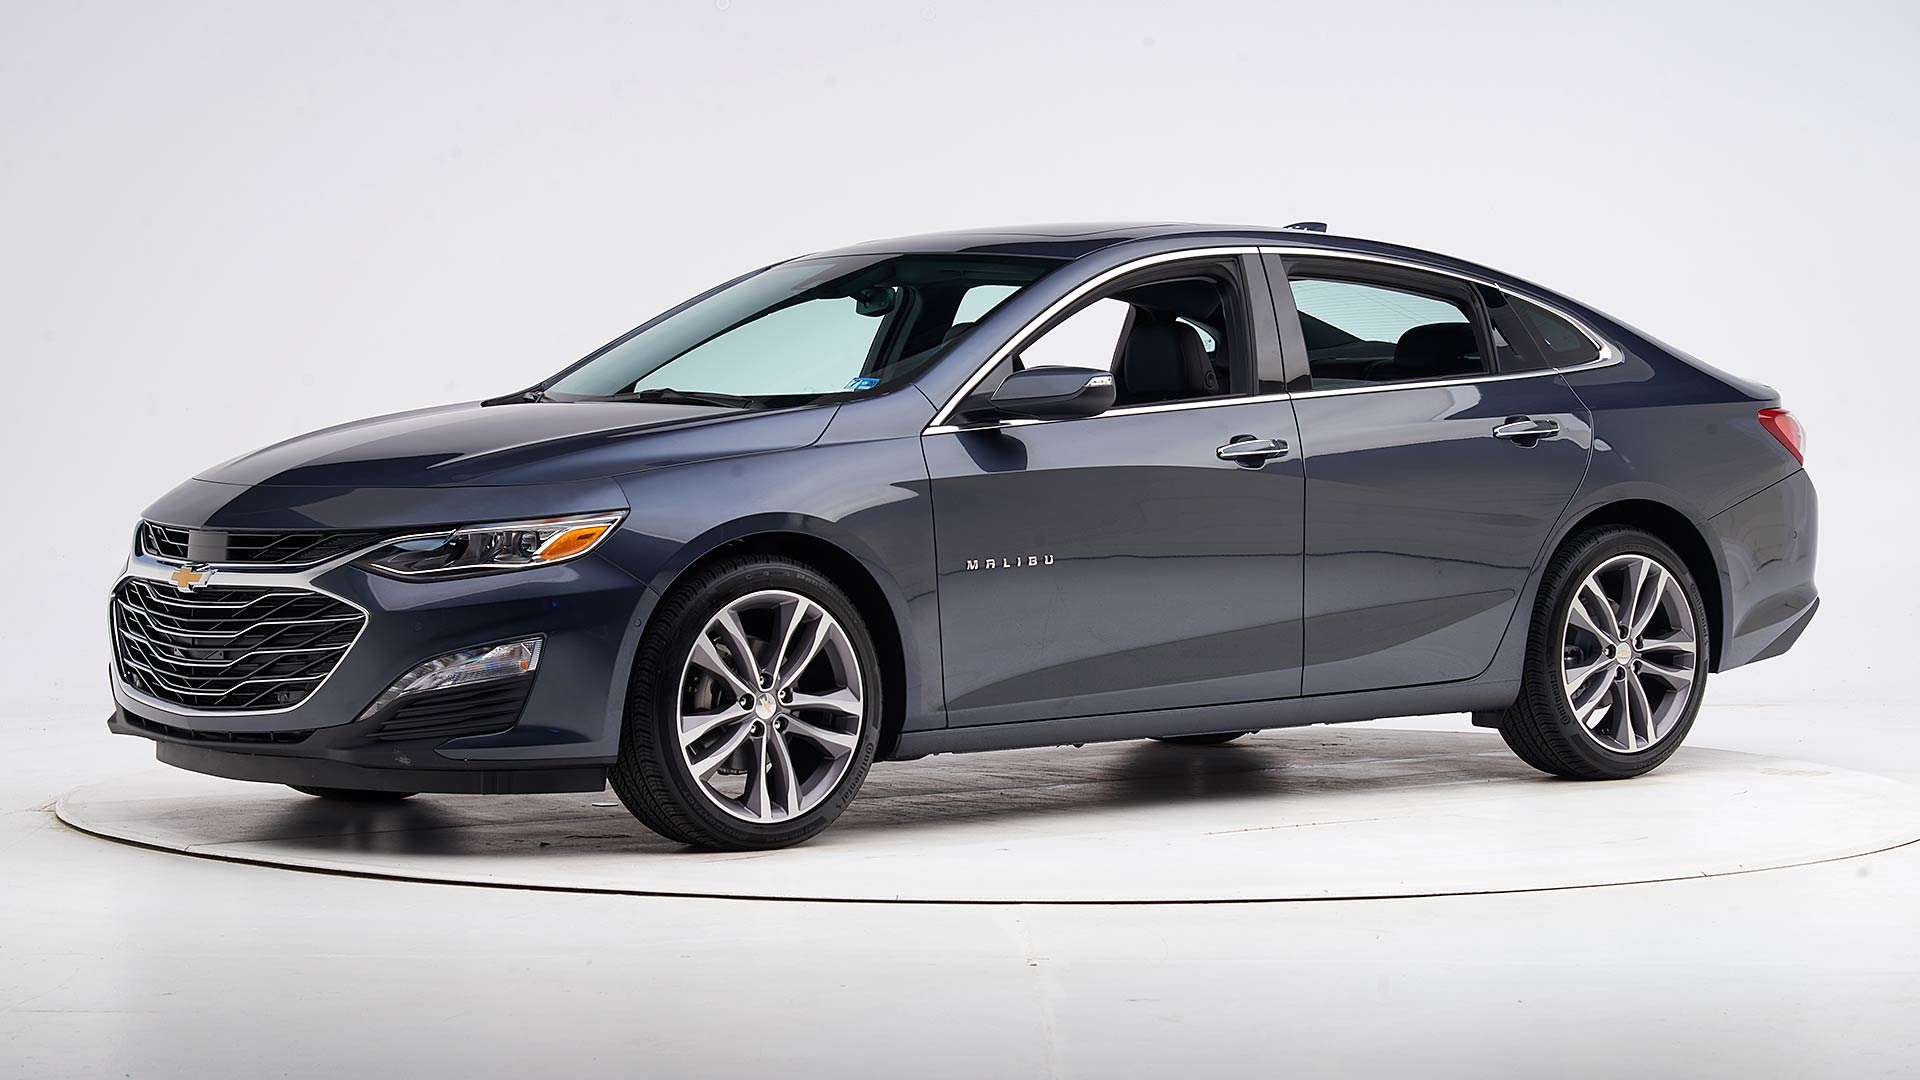 2020 Chevy Malibu Review